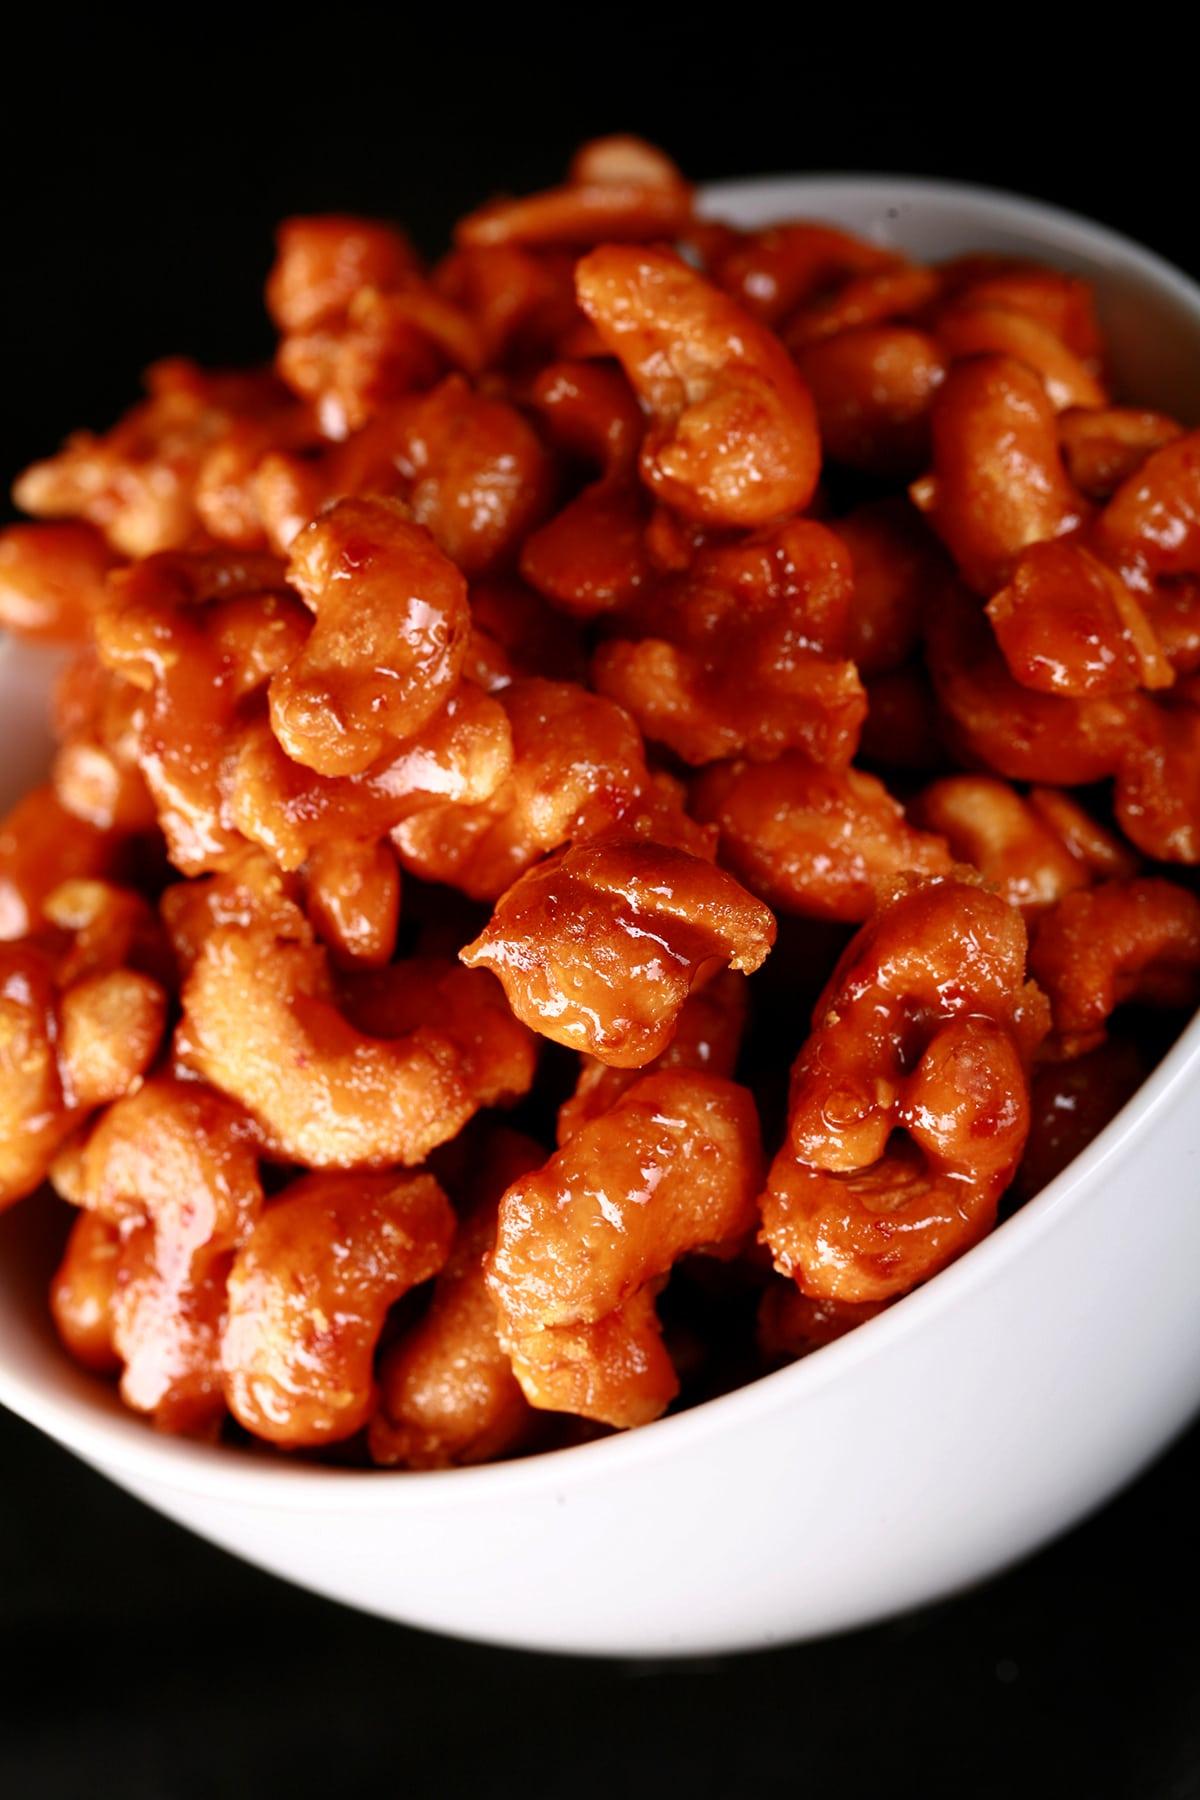 A round white bowl full of honey jeow glazed cashews.